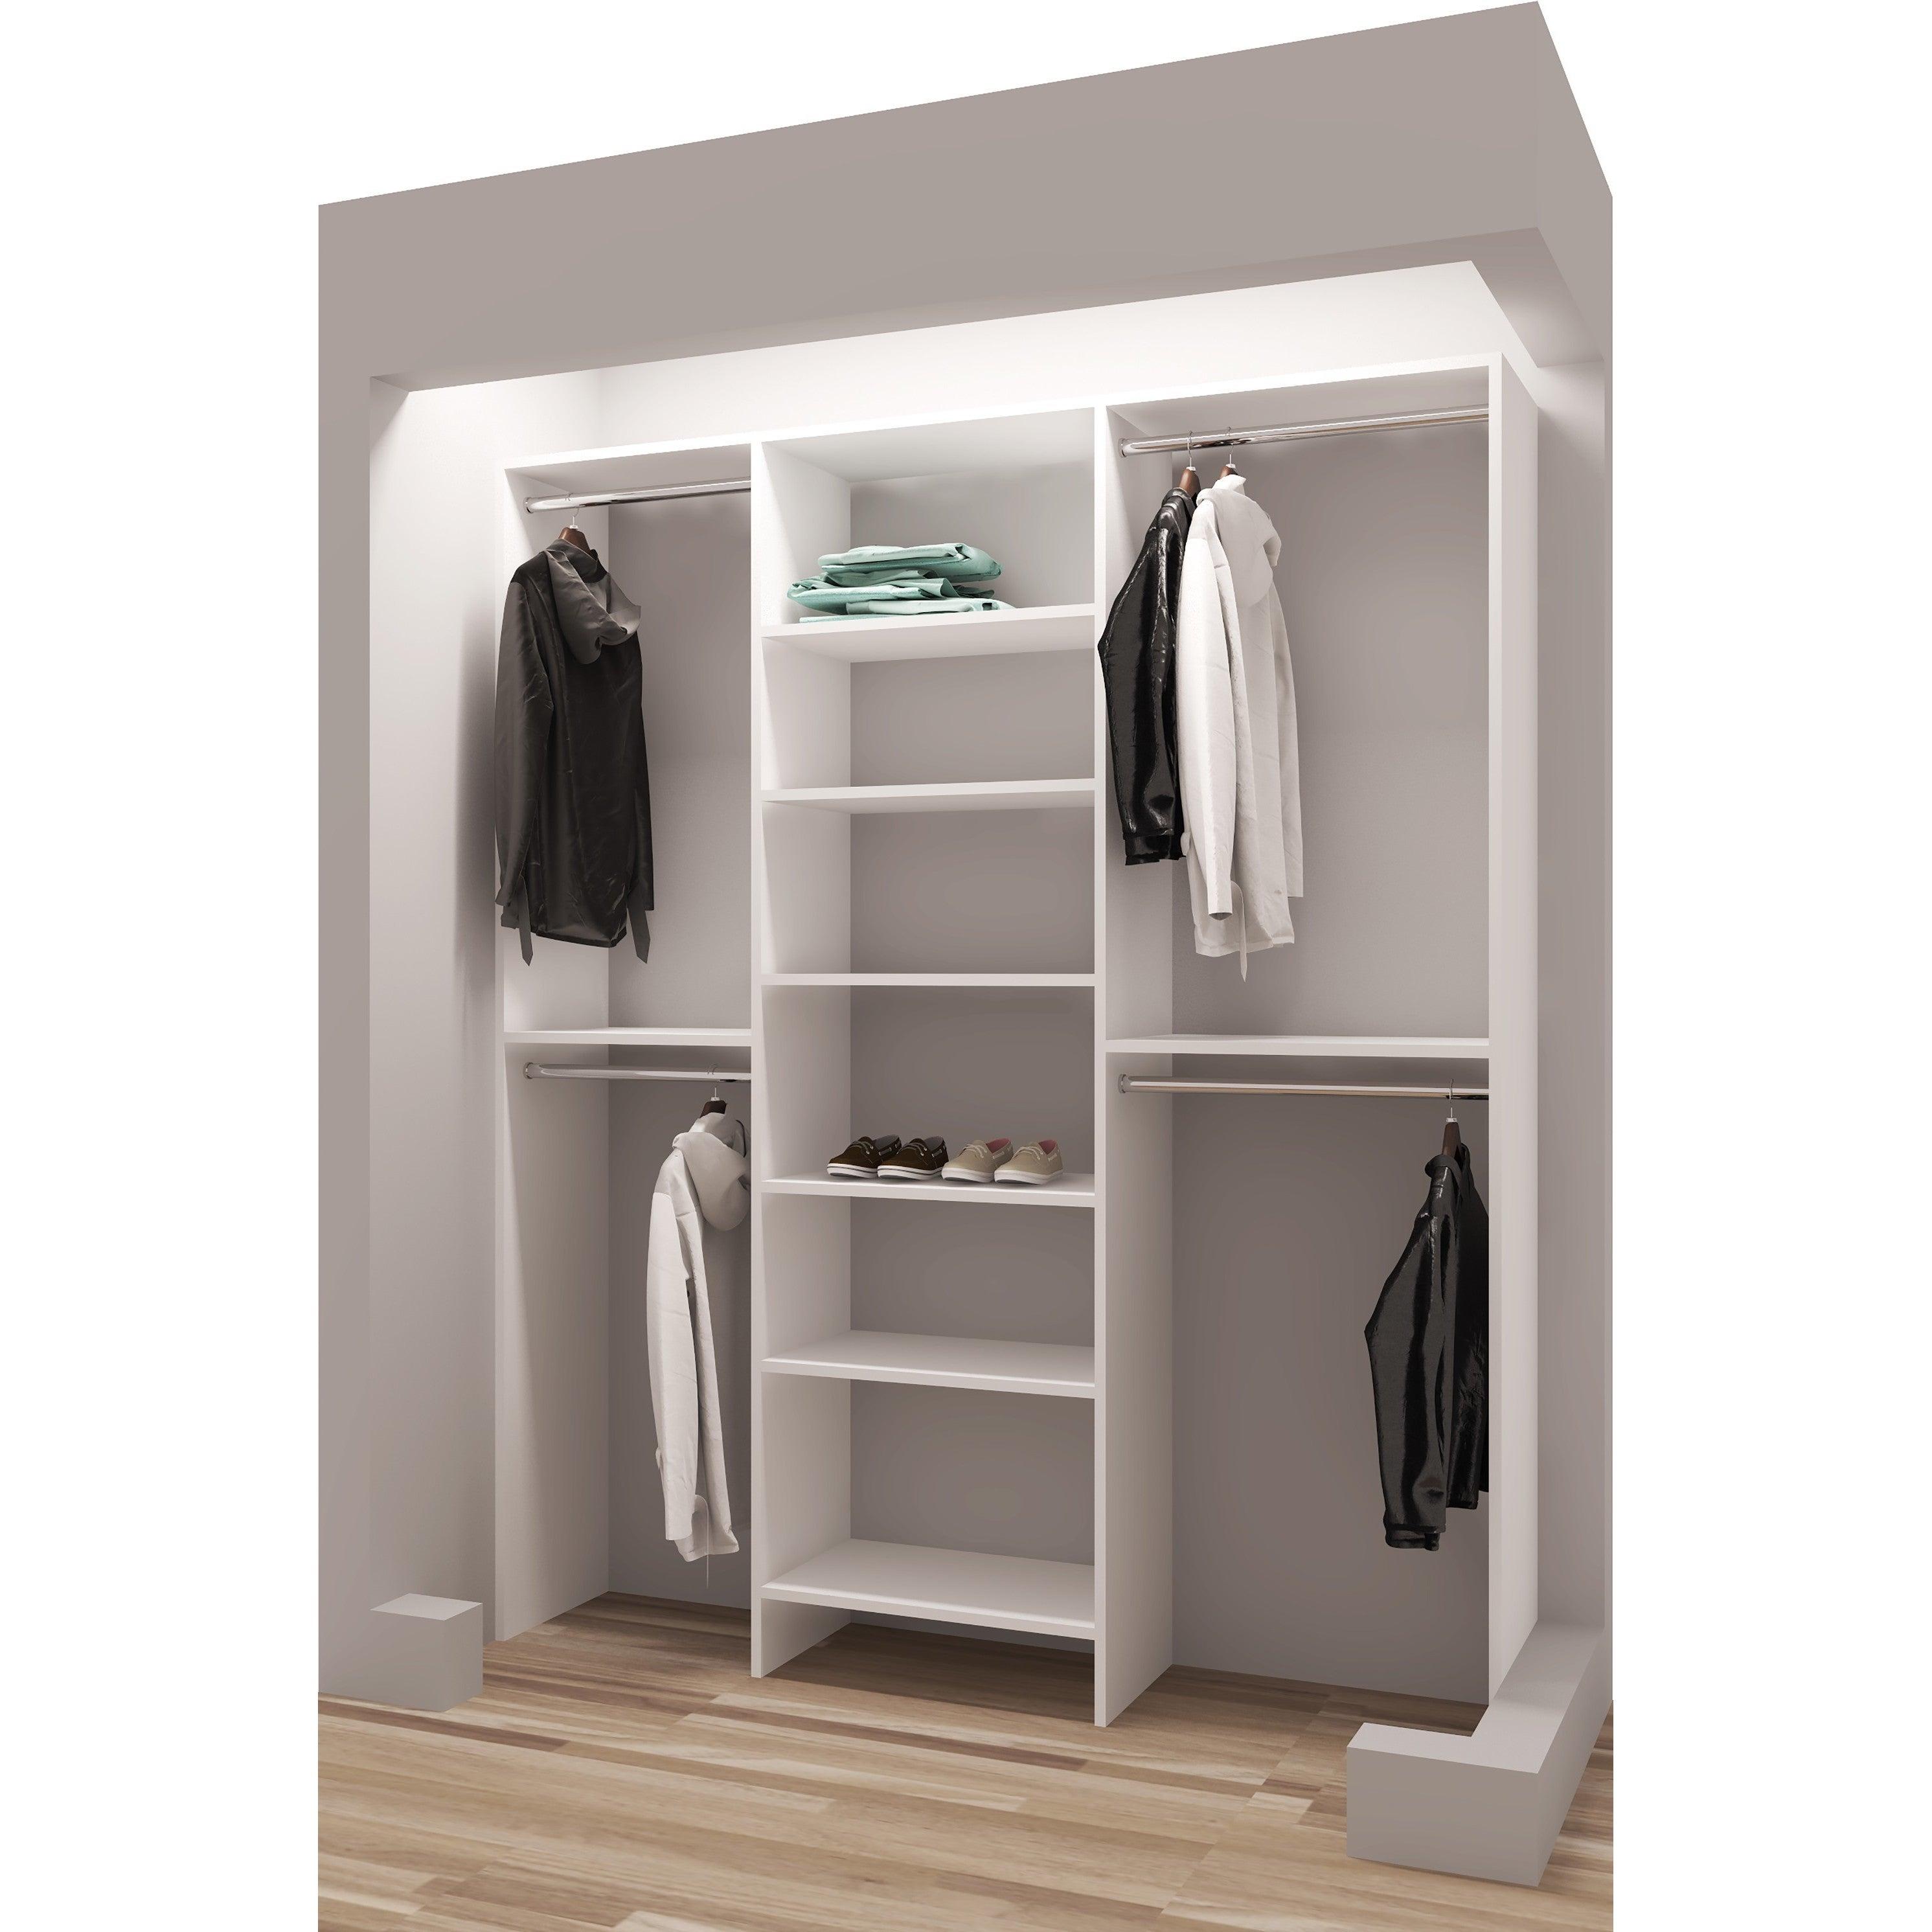 Tidysquares White Wood 63 Reach In Closet Organizer Free Shipping Today 13223496